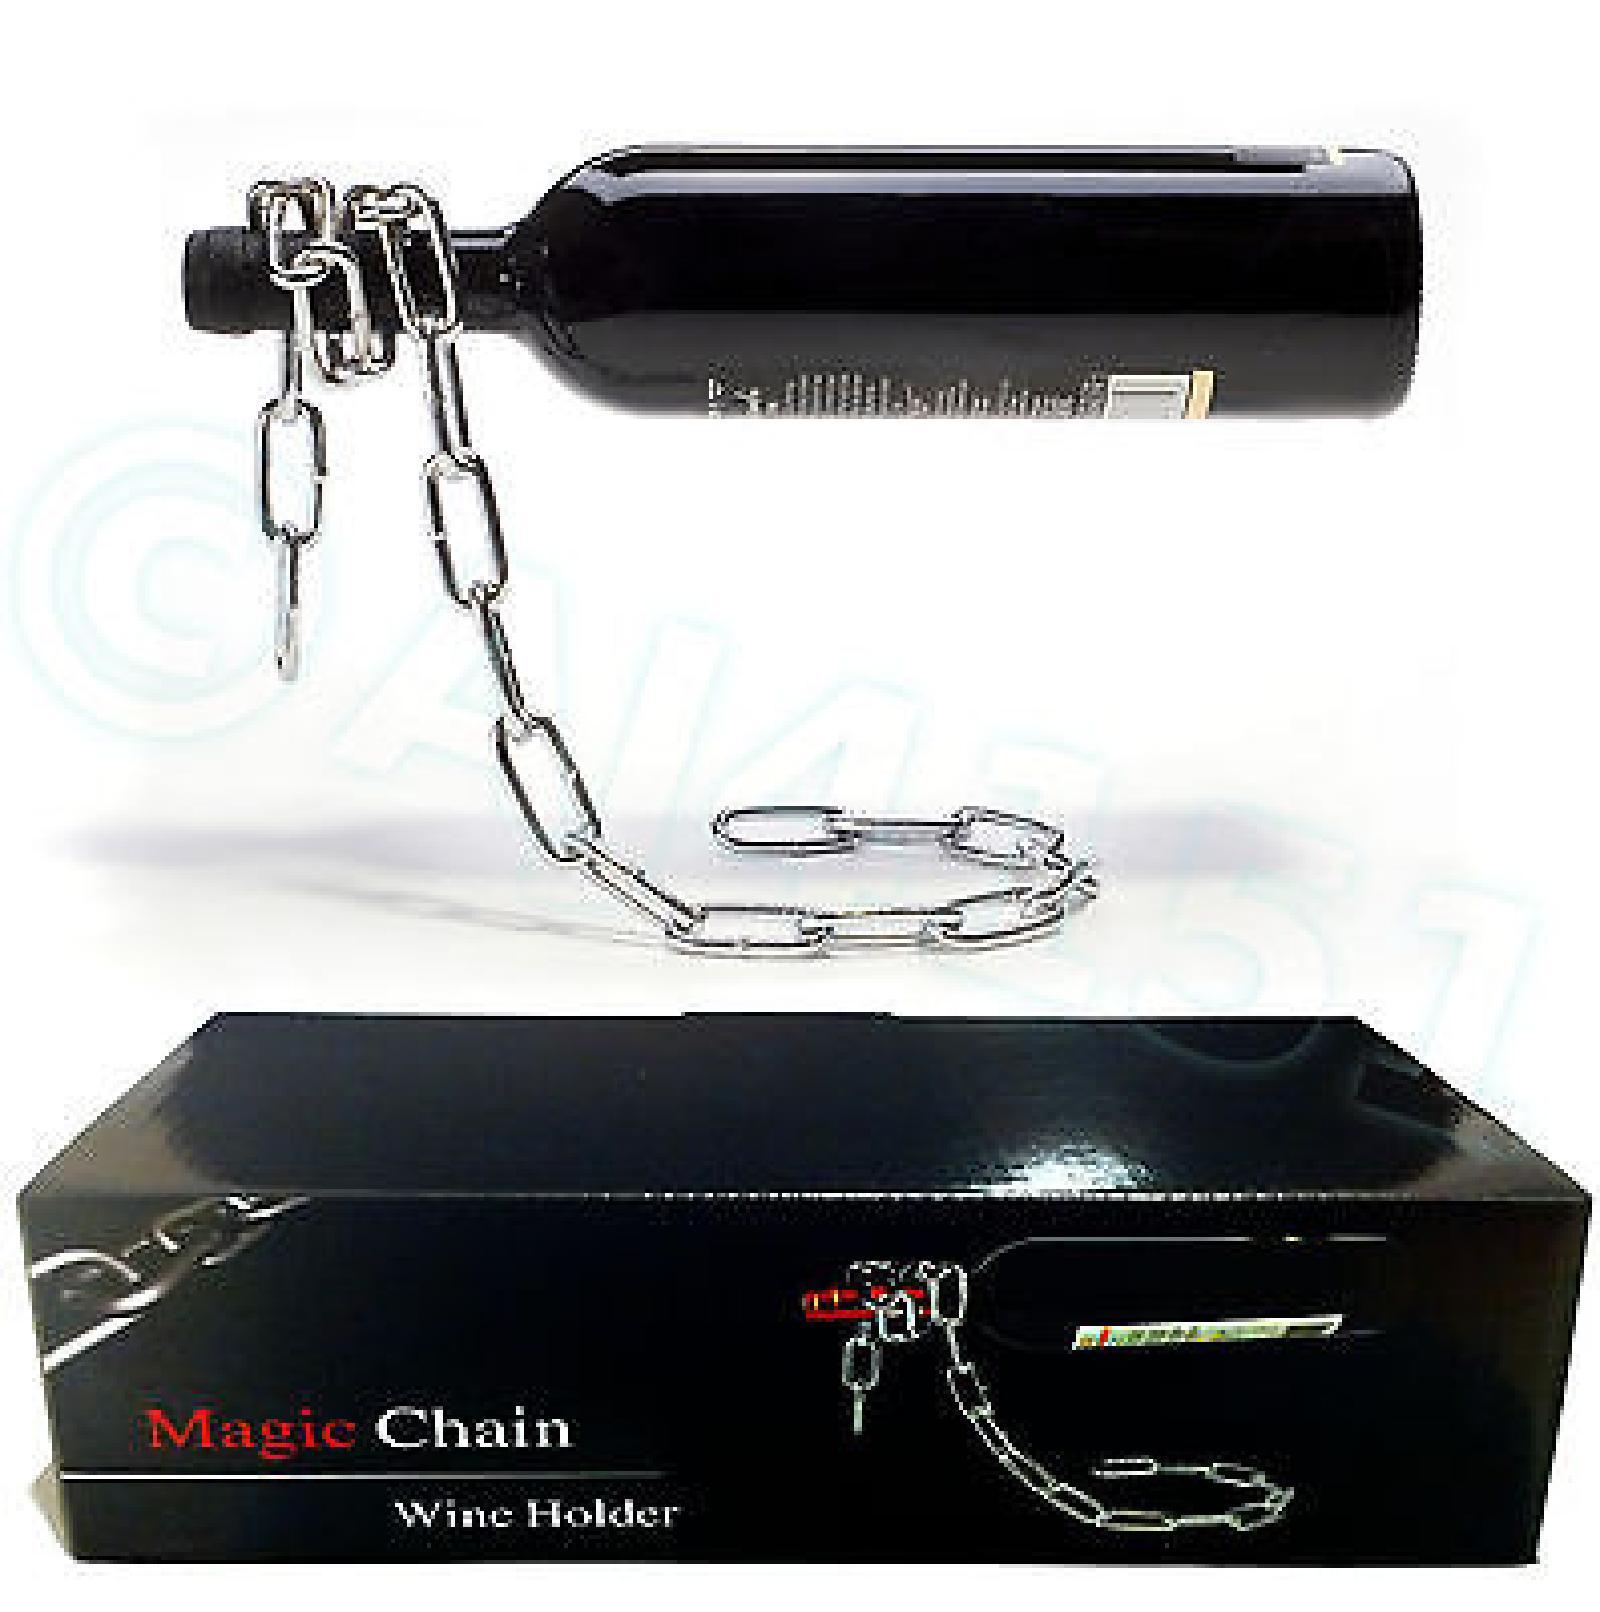 Floating Magic Chain Wine Bottle Holder Rack Illusion, Presentation Box FREEPOST